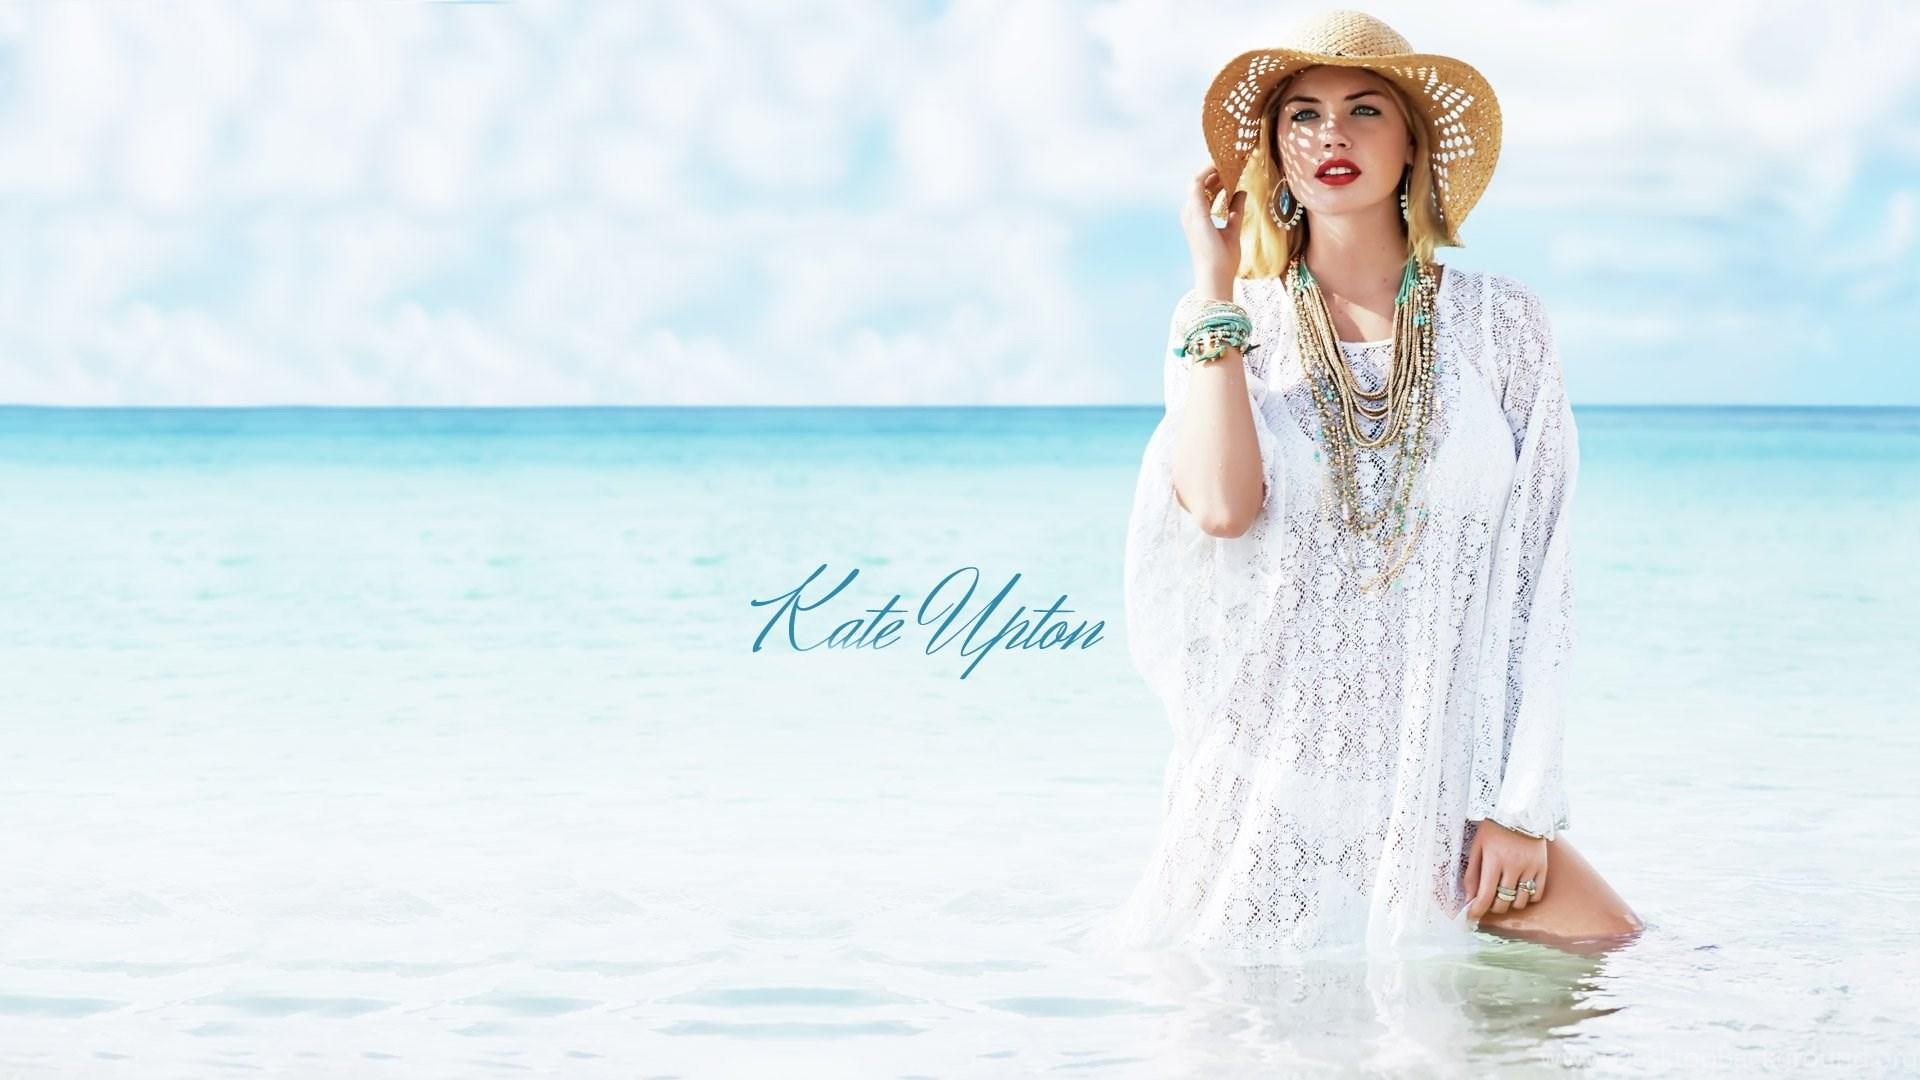 Kate Upton 1080p Hd Wallpapers Desktop Background